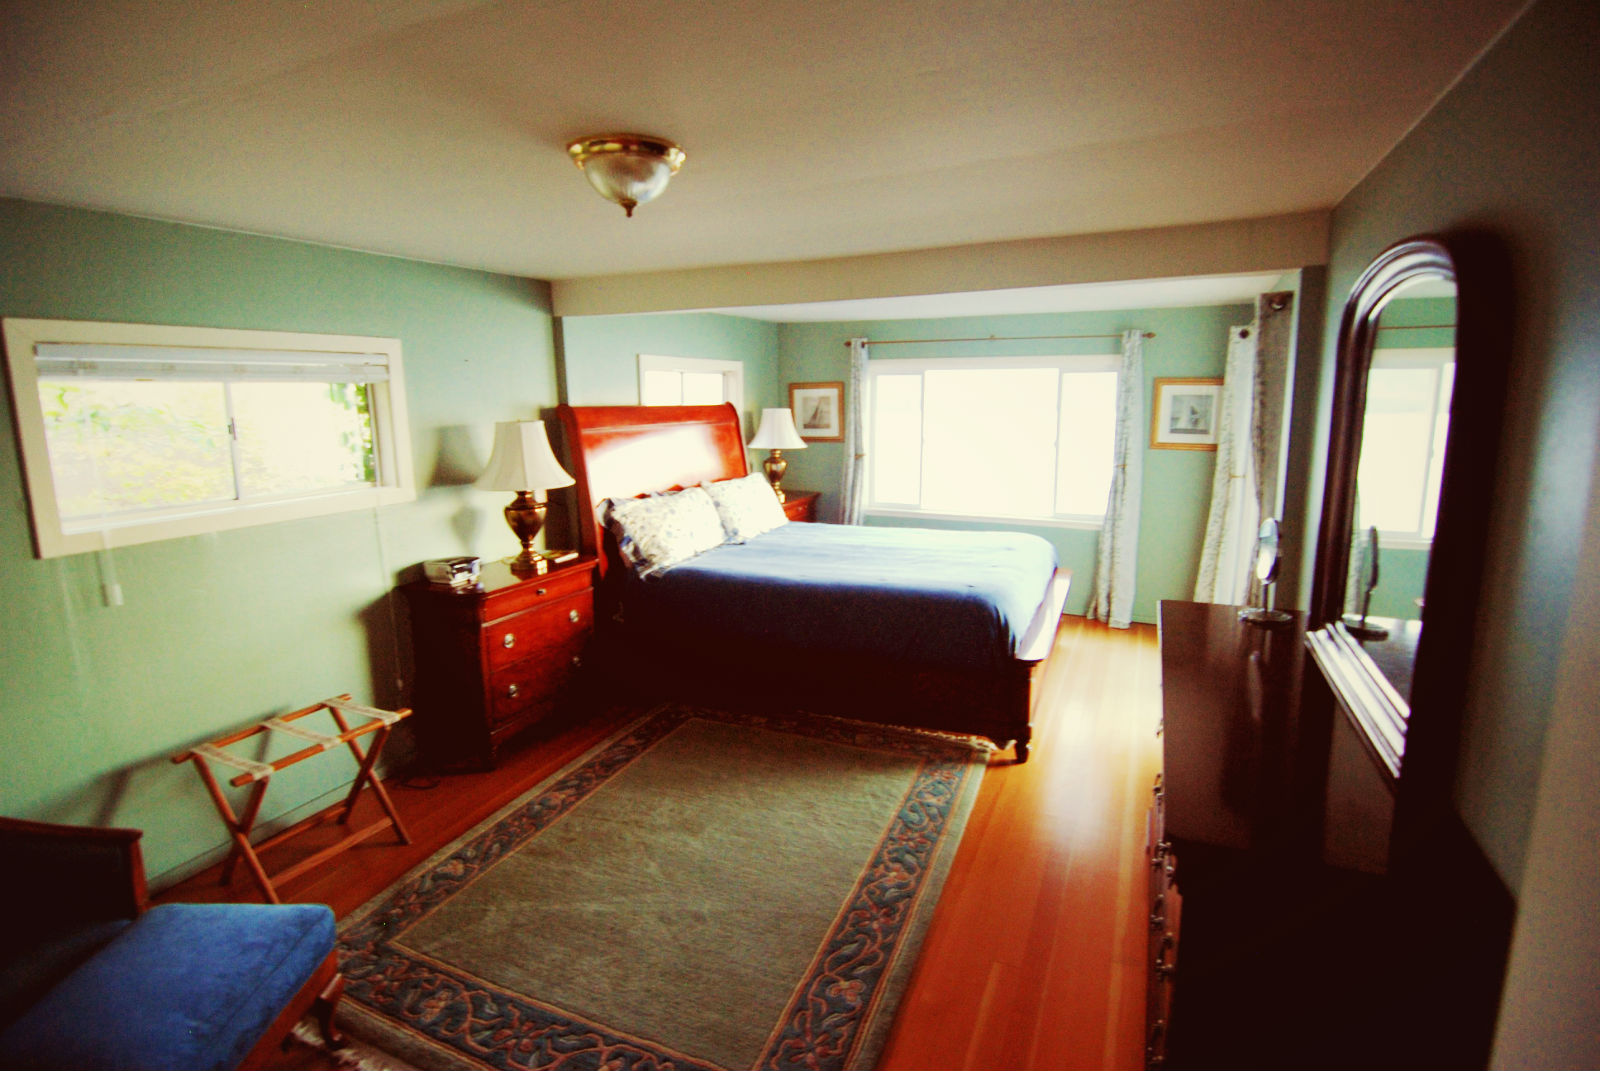 Bedroom, Rosewood Suite, Jenner Inn